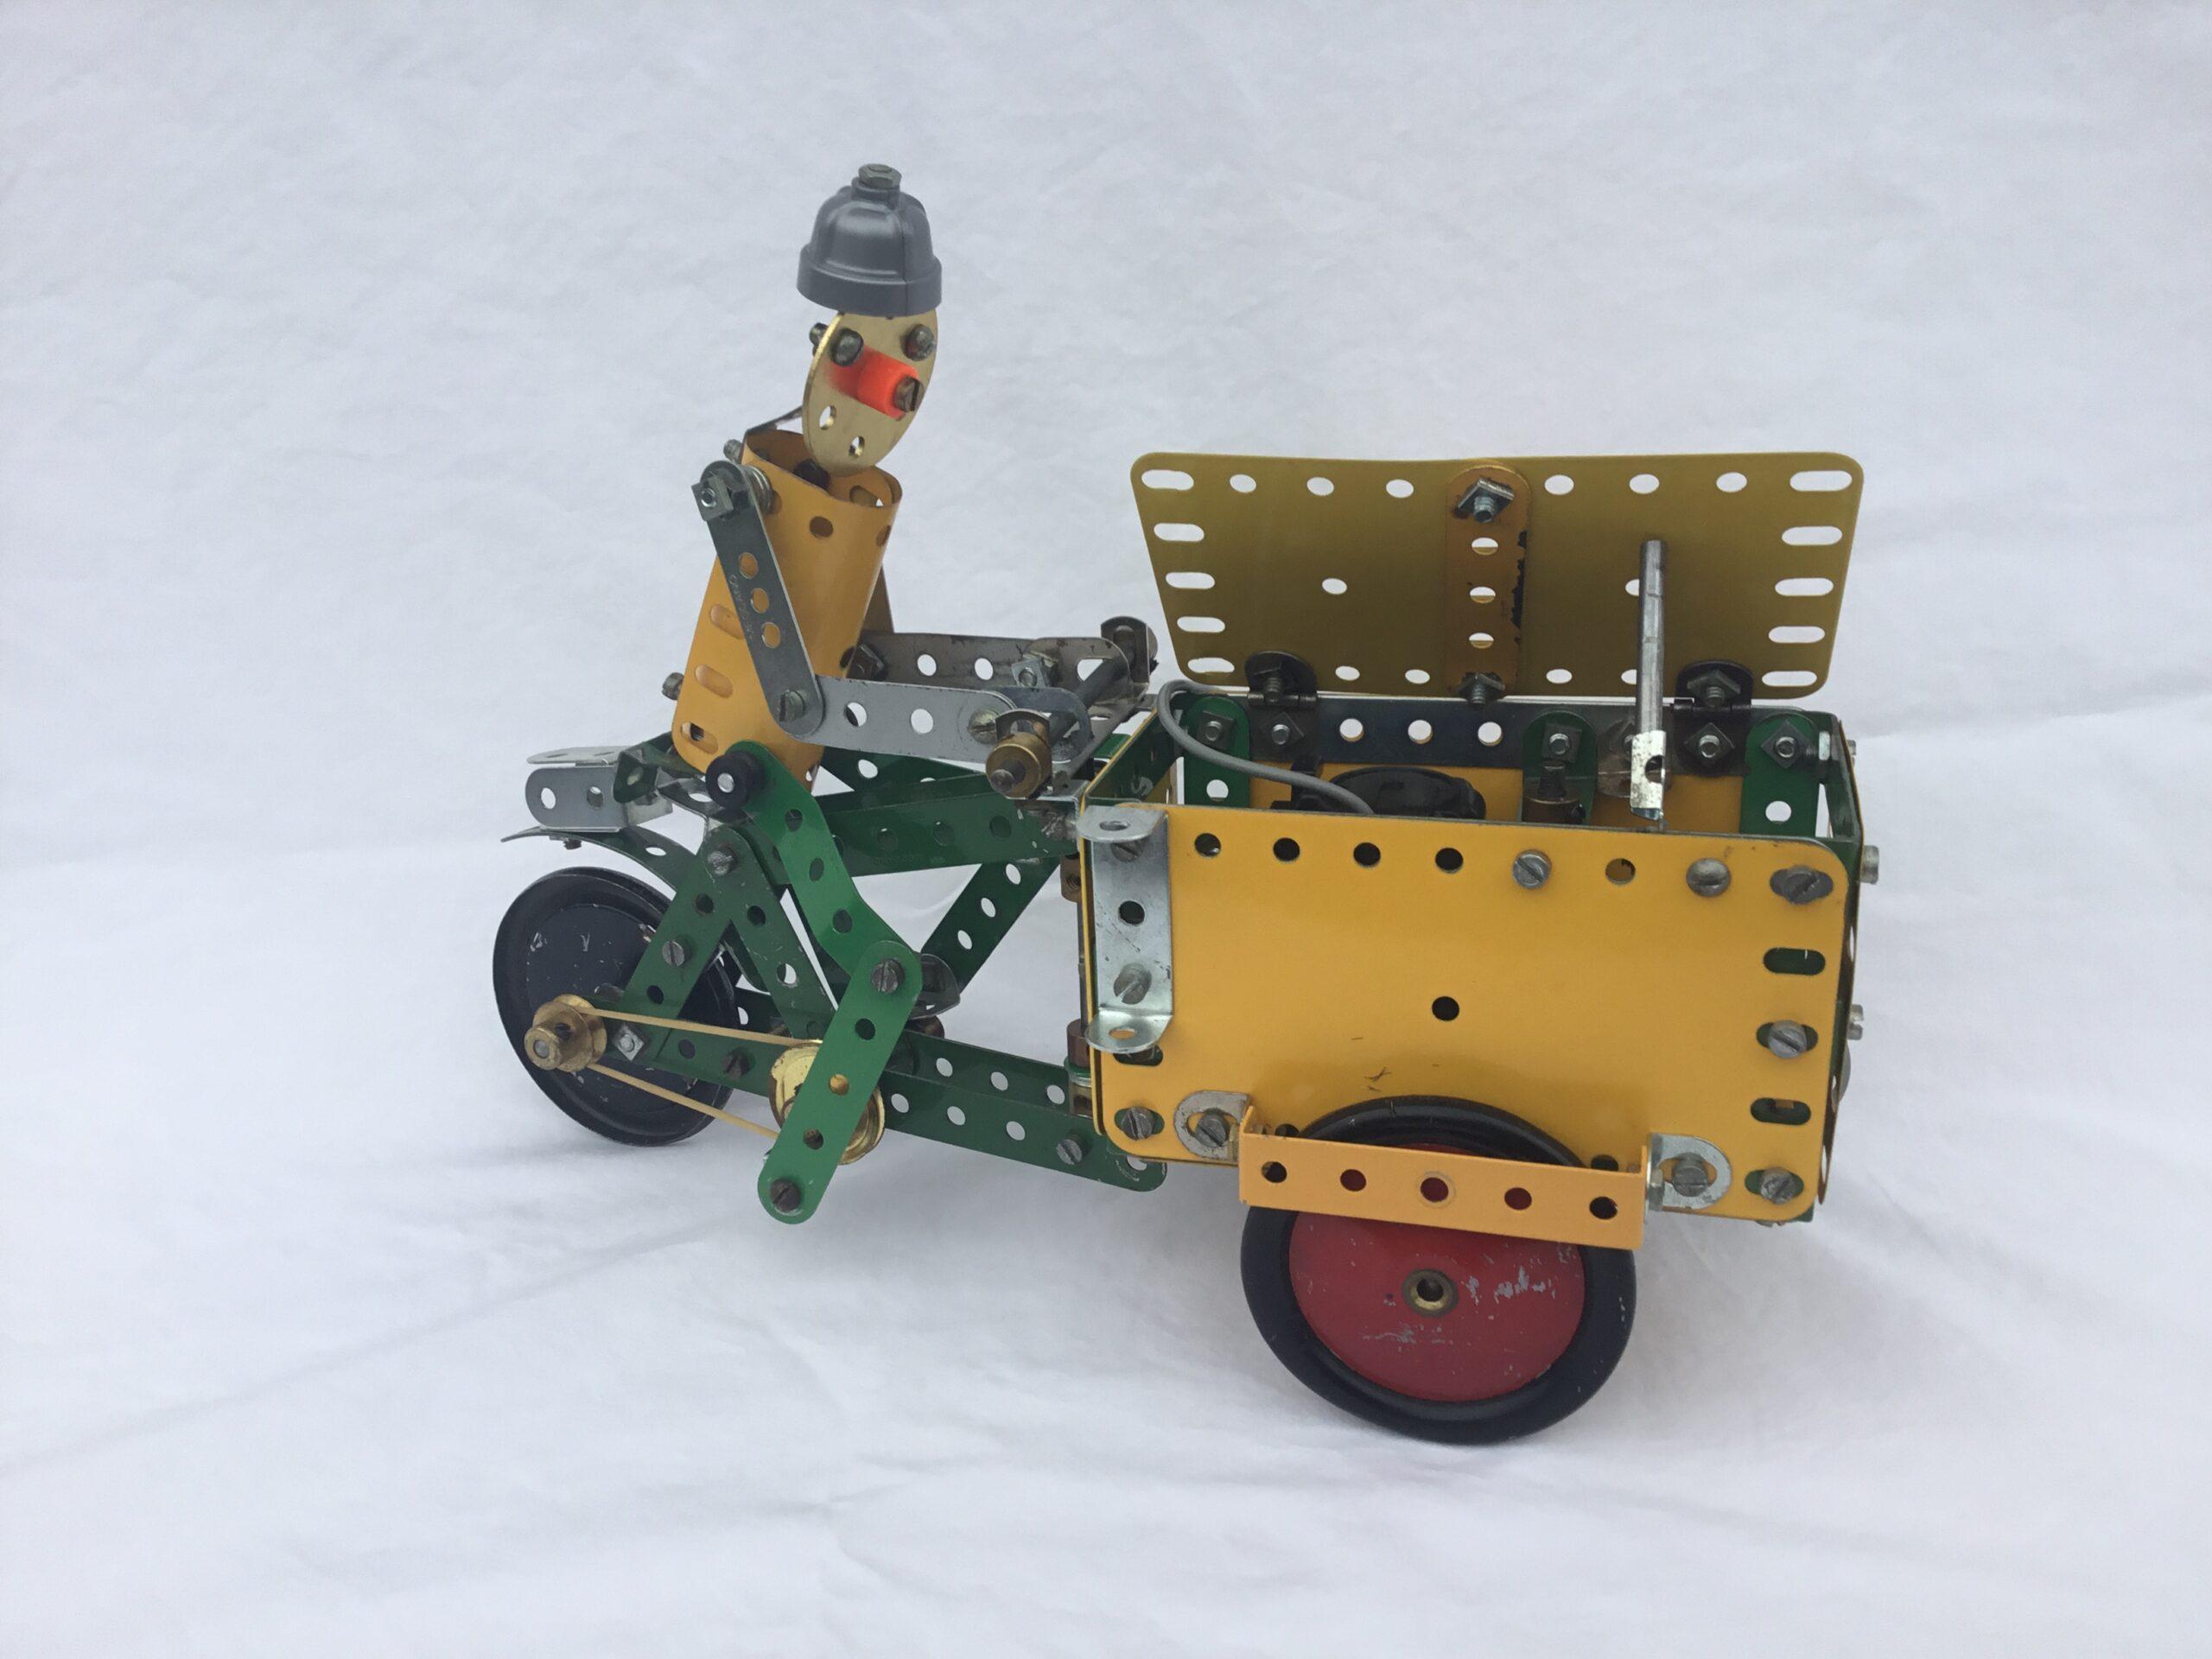 ME Piotr's bike